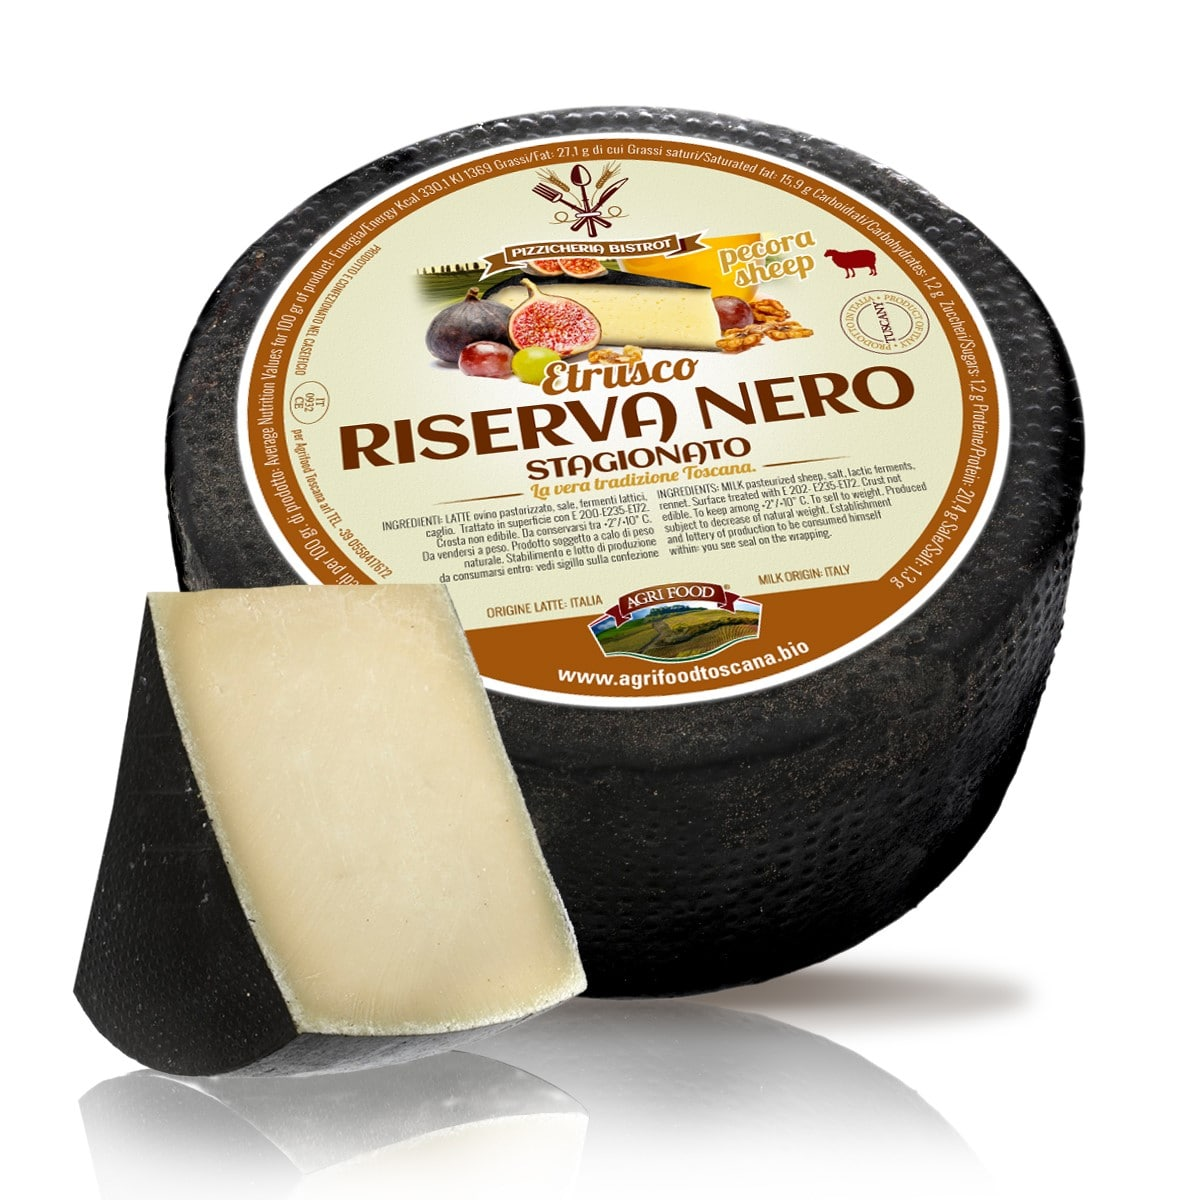 formaggio etrusco riserva, agrifood toscana